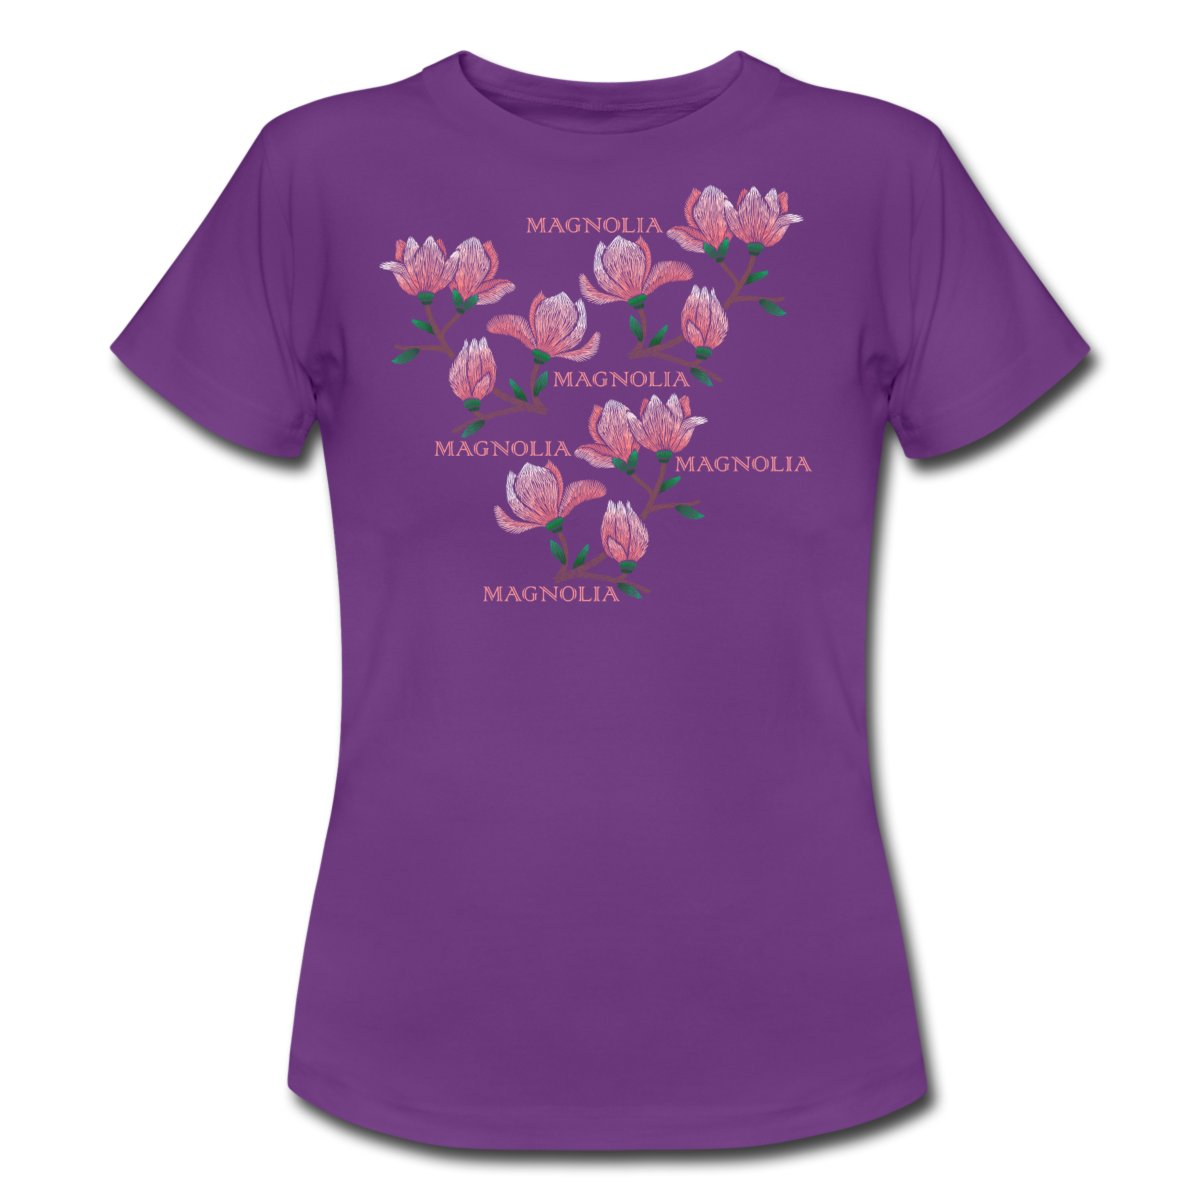 magnolia-t-shirt-dam-l.jpg